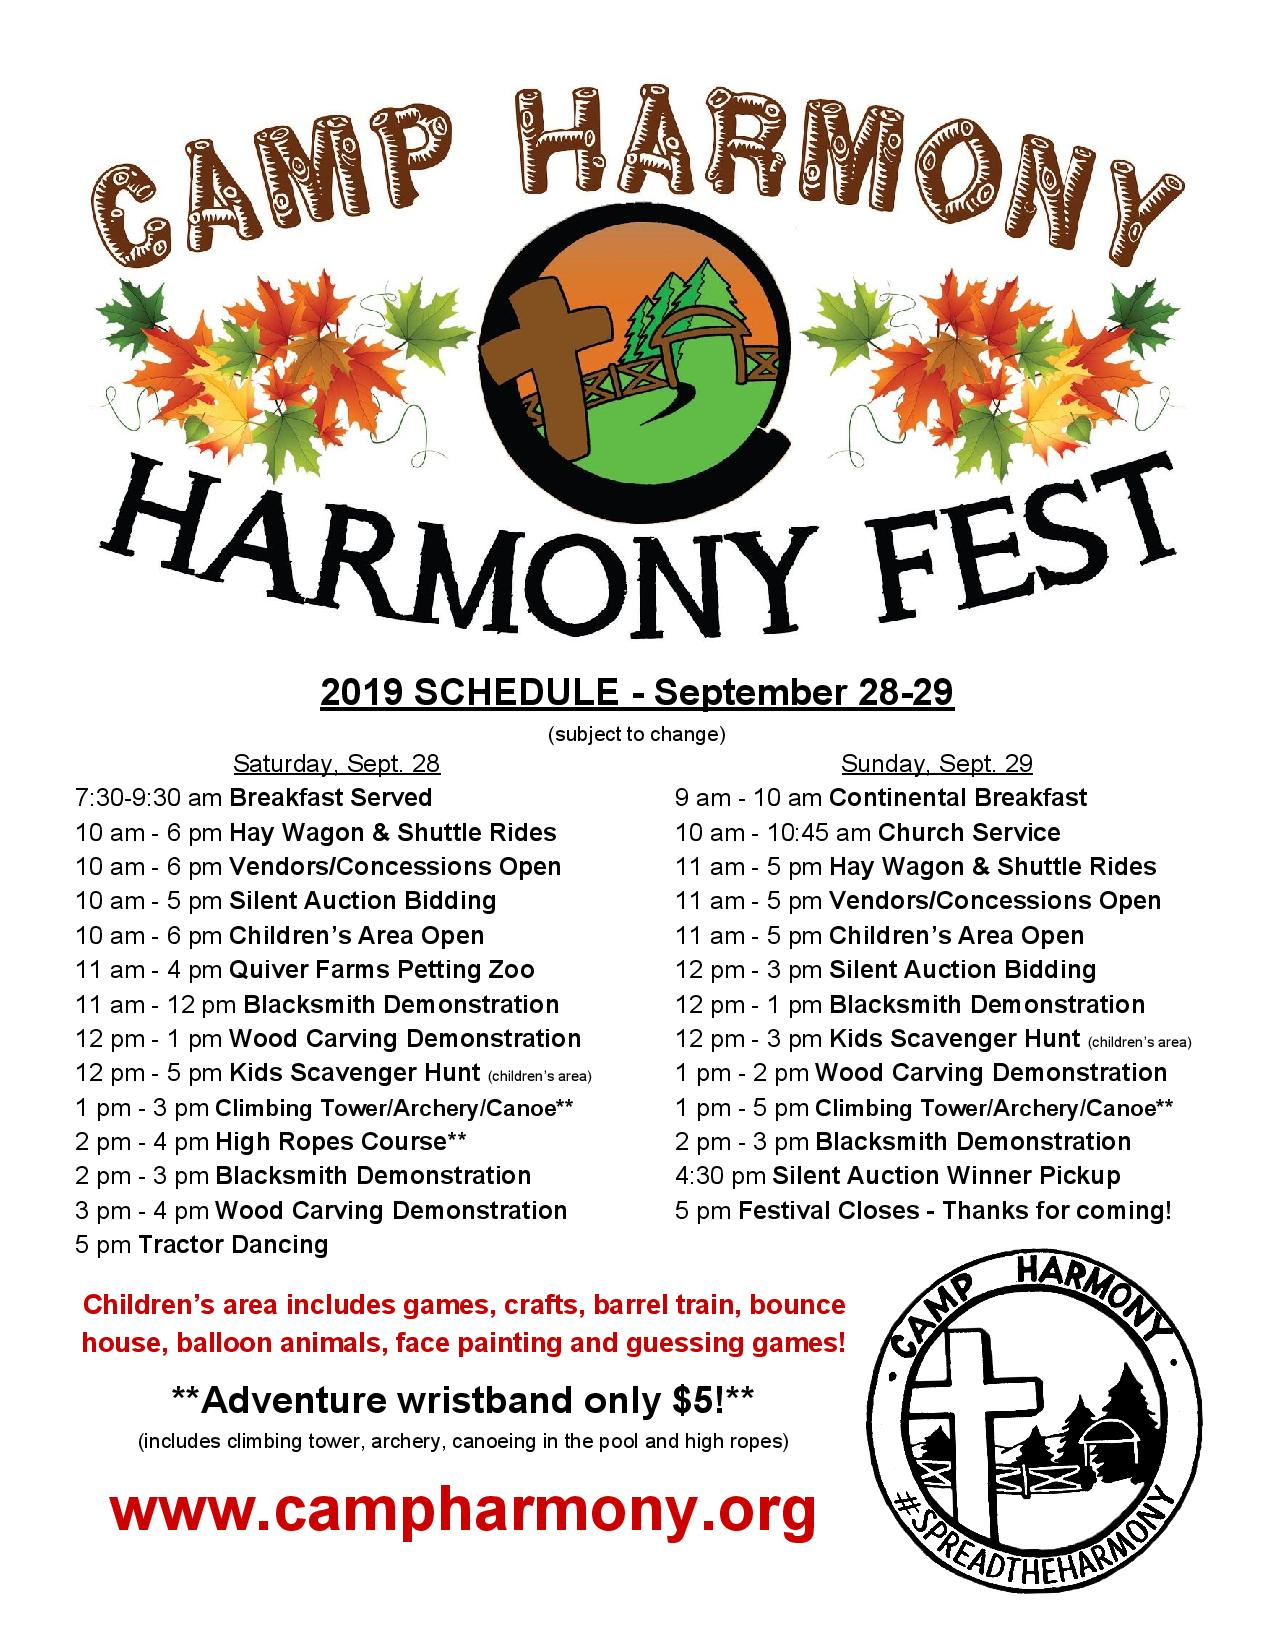 Harmony Fest Schedule 2019.jpg